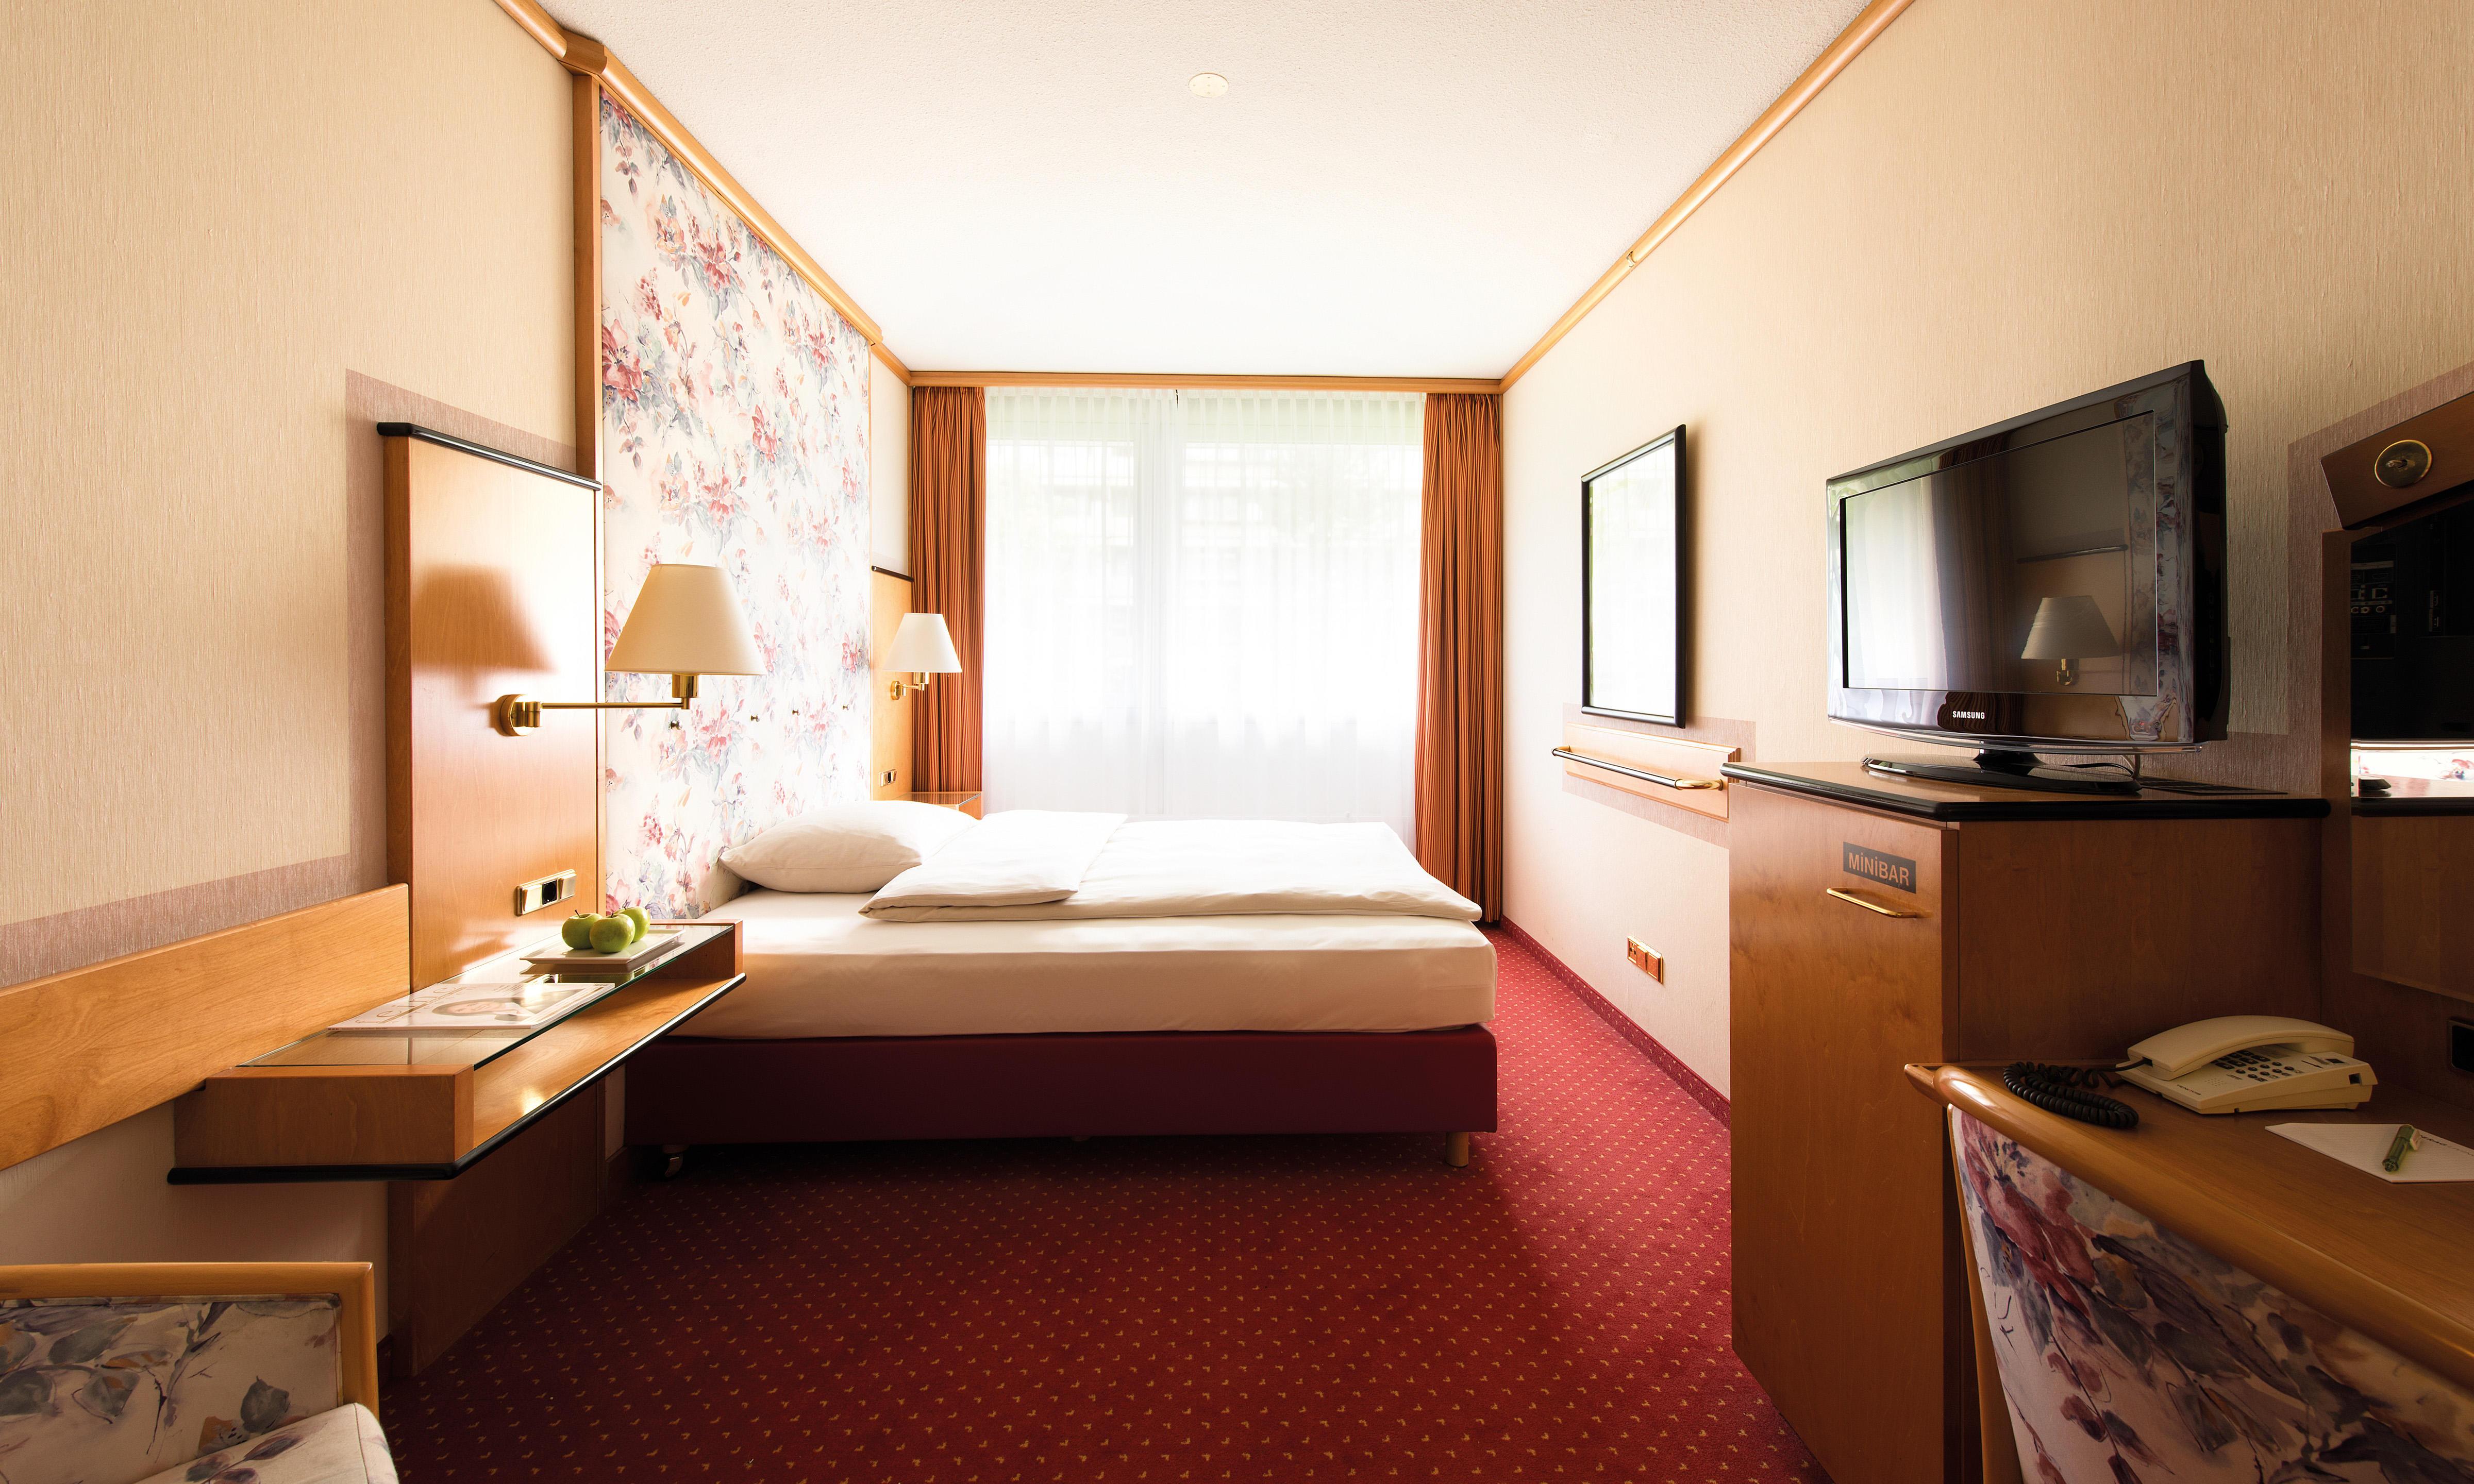 living hotel am deutschen museum m nchen rablstra e 10. Black Bedroom Furniture Sets. Home Design Ideas